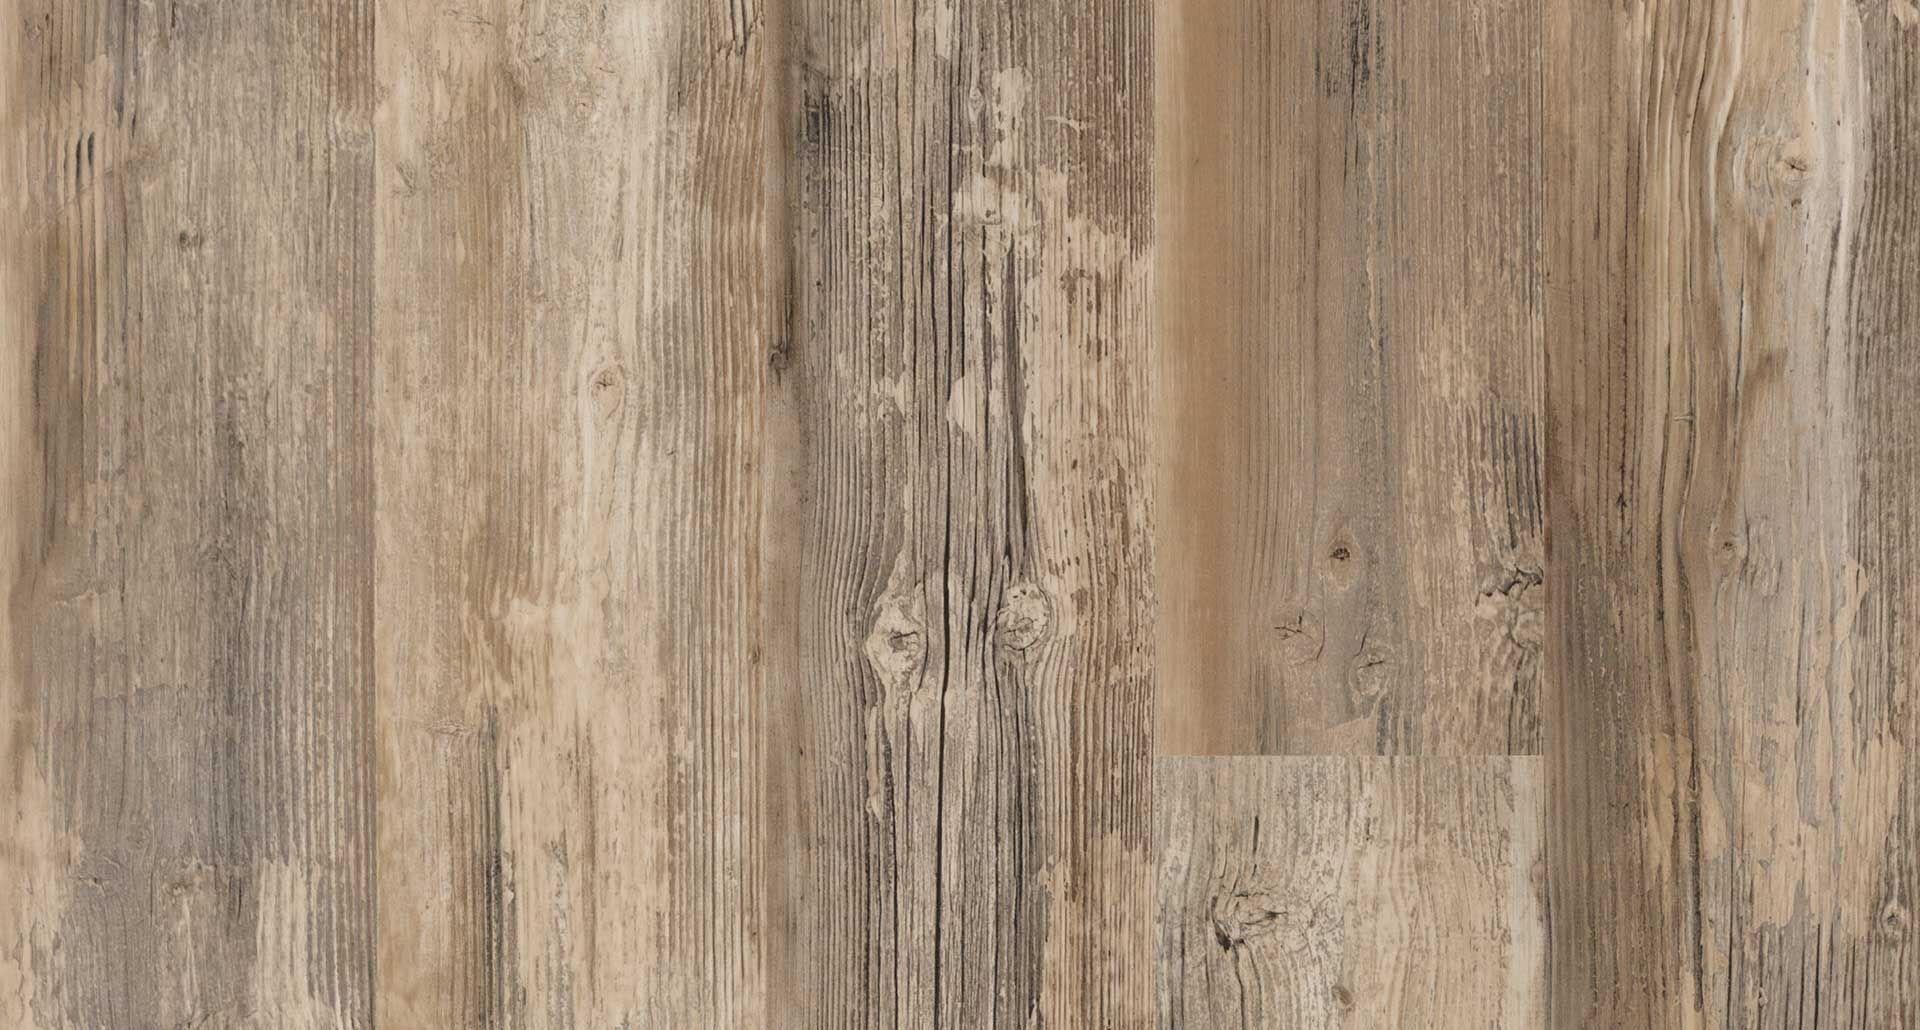 Handscraped 1 Strip Plank Newport Pine Pergo Max Laminate Flooring Flooring Refinishing Floors Laminate Flooring